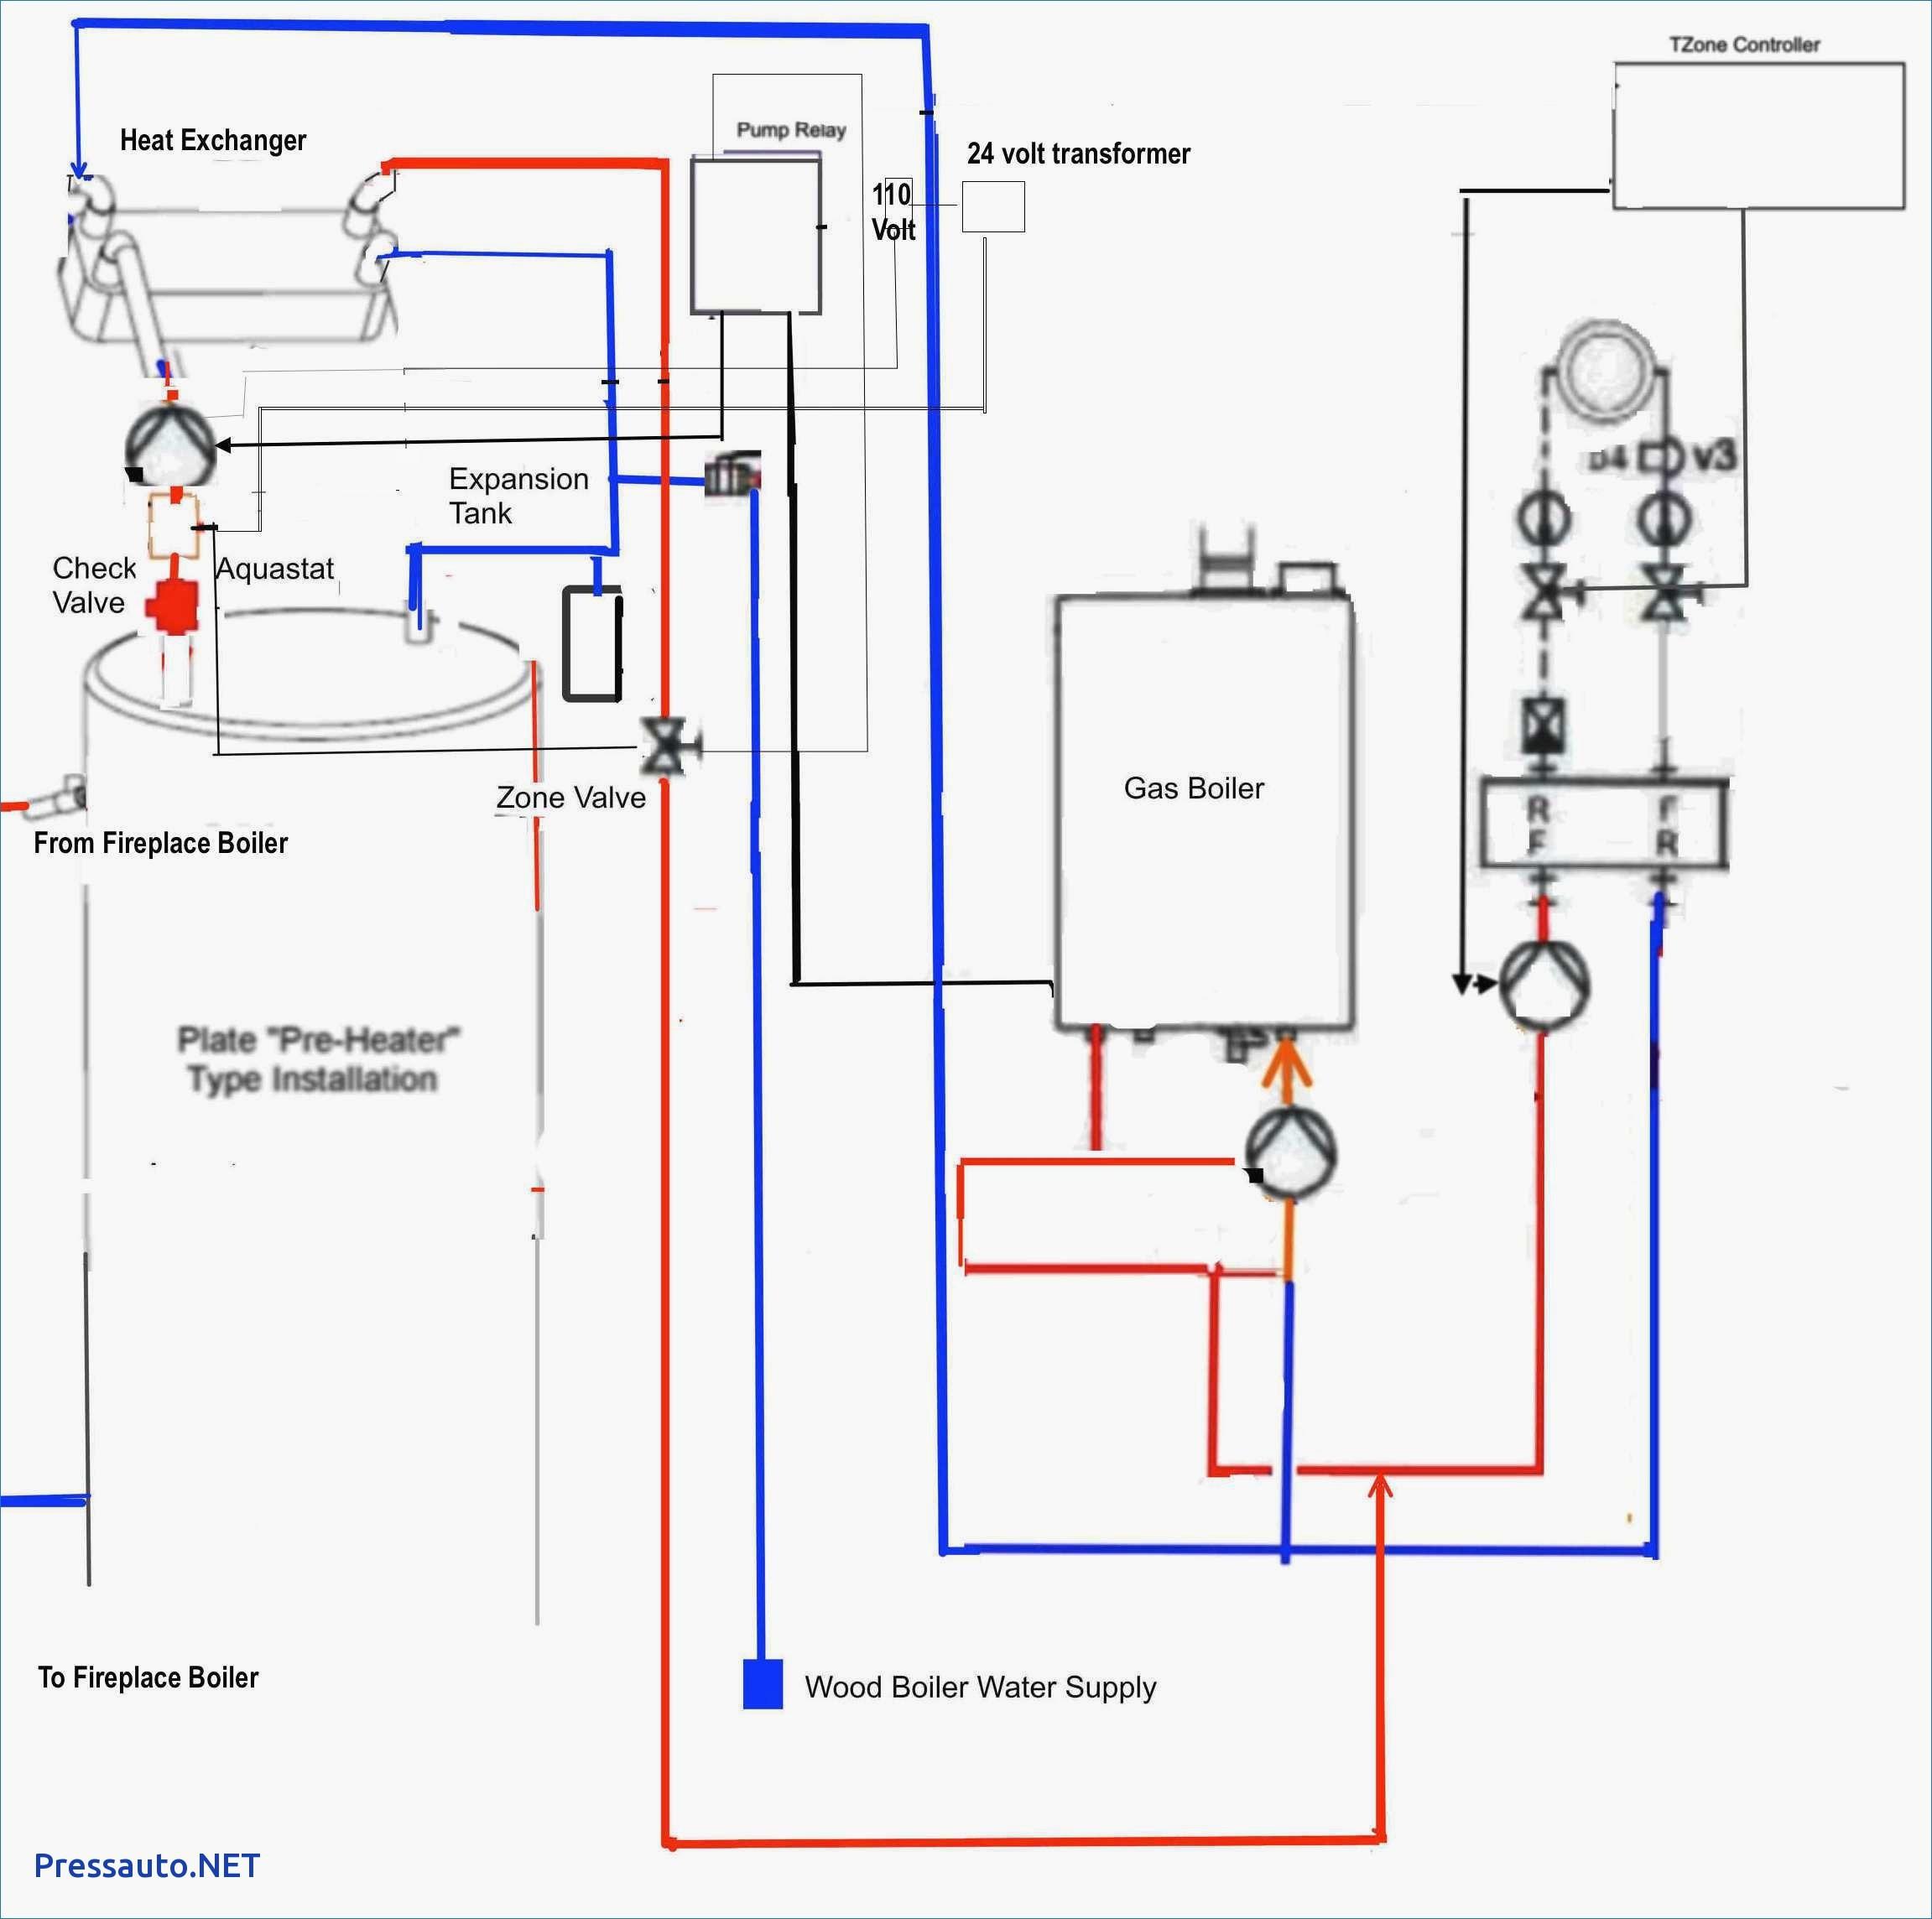 Honeywell Aquastat Wiring Diagram Common C | Wiring Diagram - Honeywell Aquastat L8148E Wiring Diagram